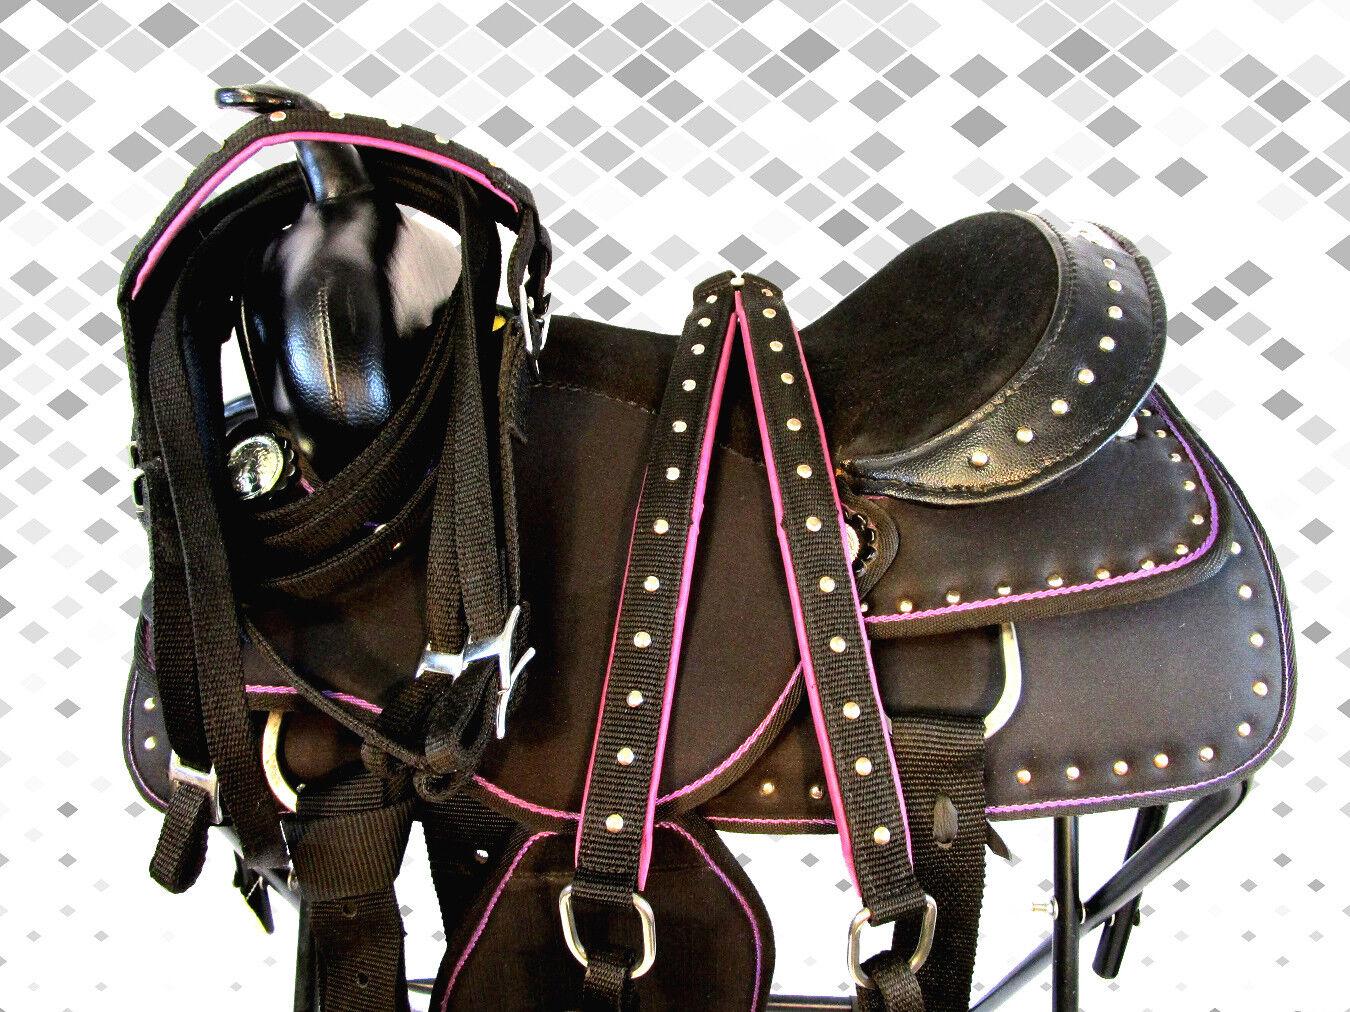 Usado 15 16 Púrpura Negro barril Racing Trail placer Sintético Silla De Montar Western